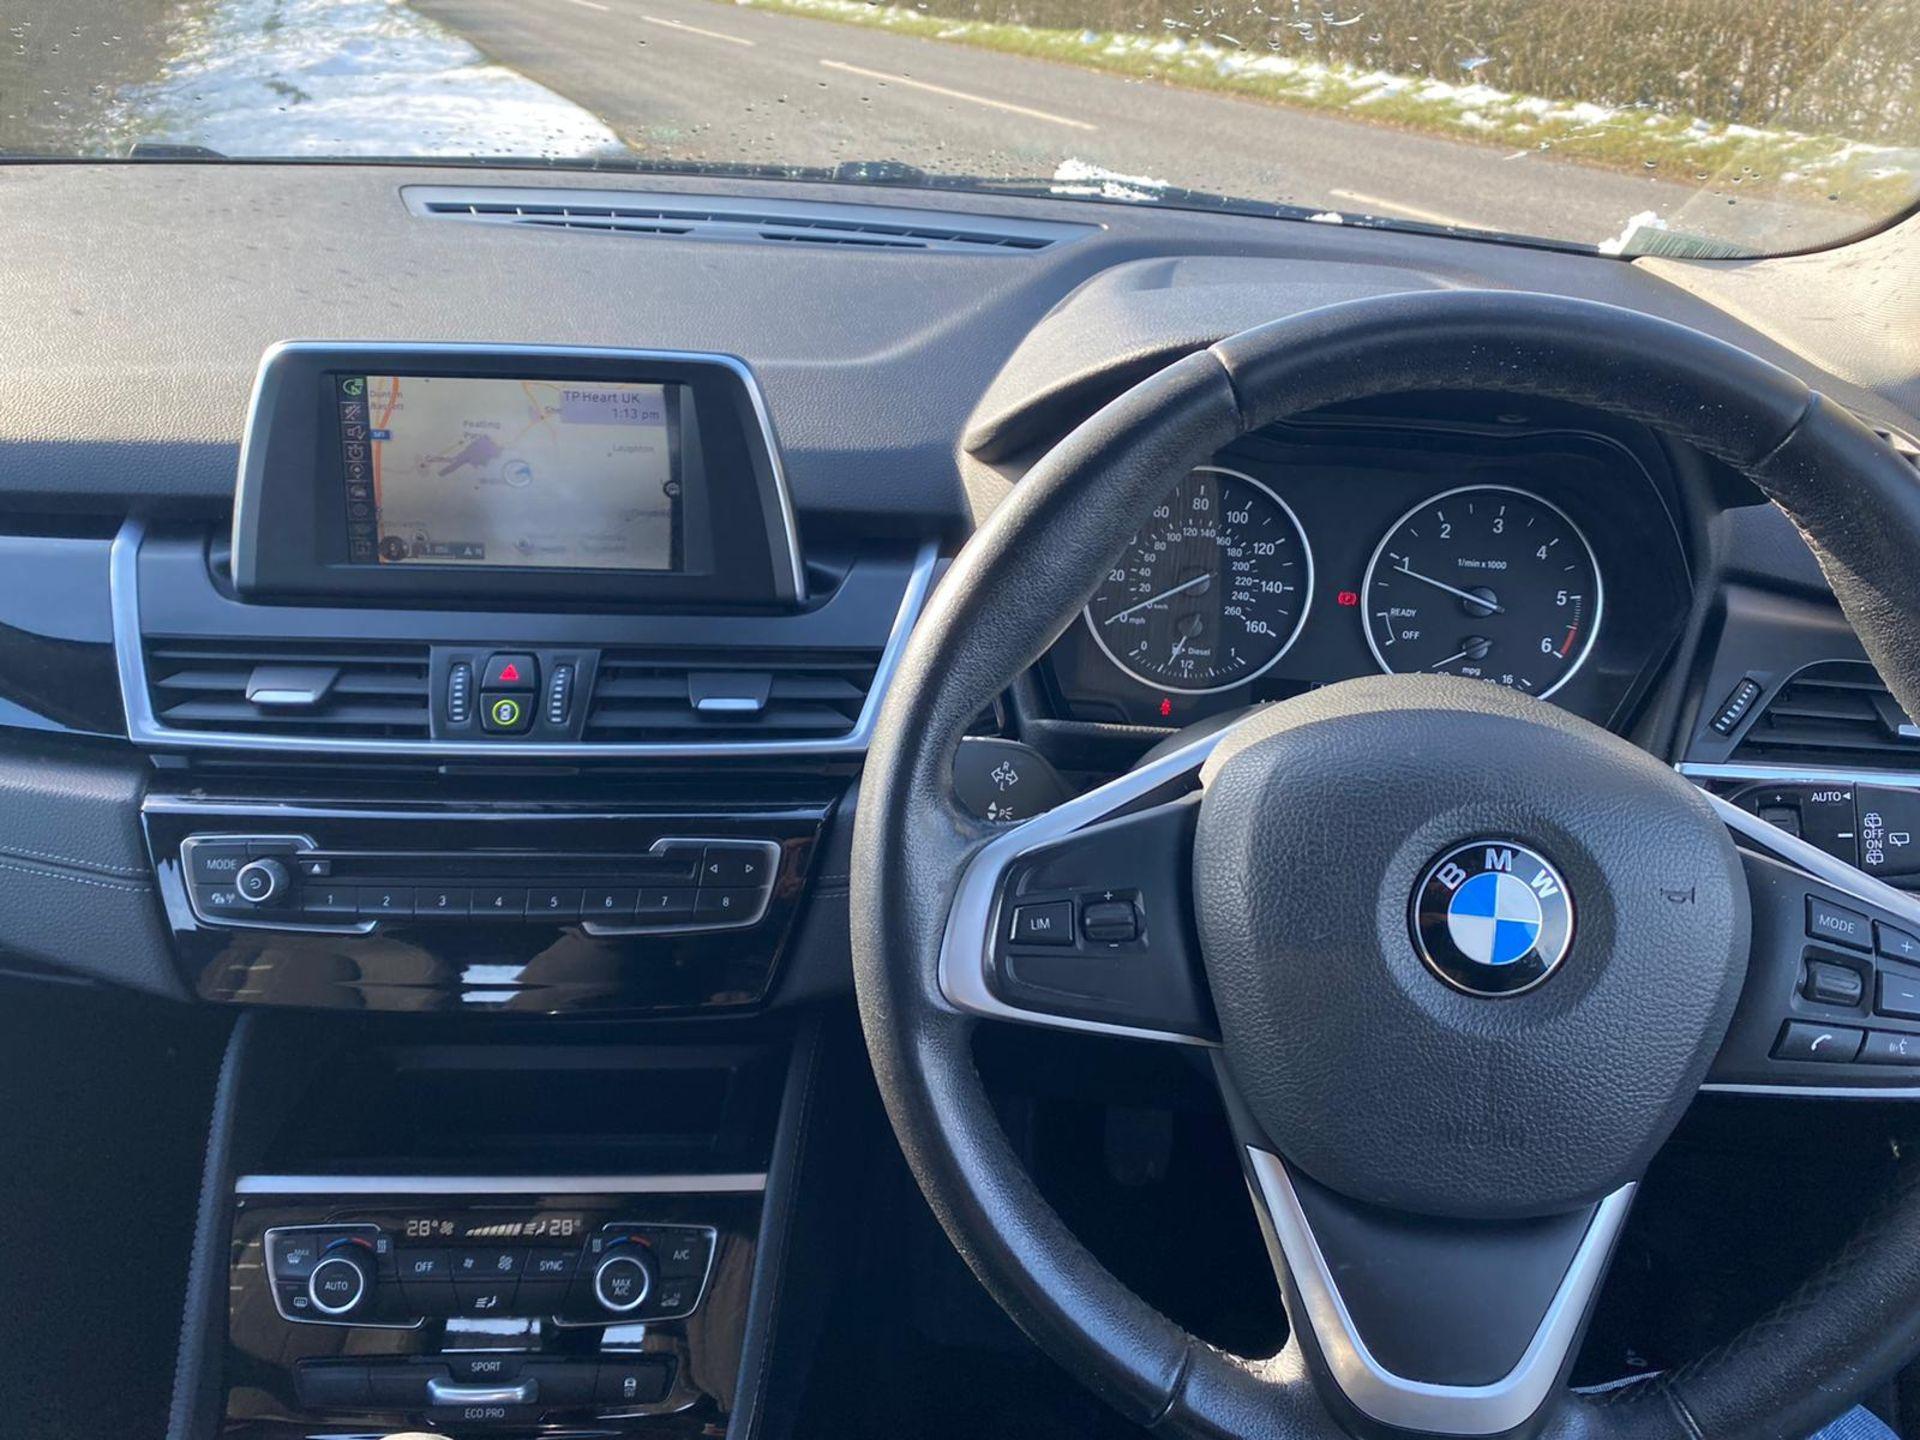 "ON SALE BMW 218d ""SPORT"" MPV 2.0 DIESEL ""EURO 6"" (2016 REG) - 1 OWNER - GREAT SPEC - BLACK - LOOK!! - Image 13 of 16"